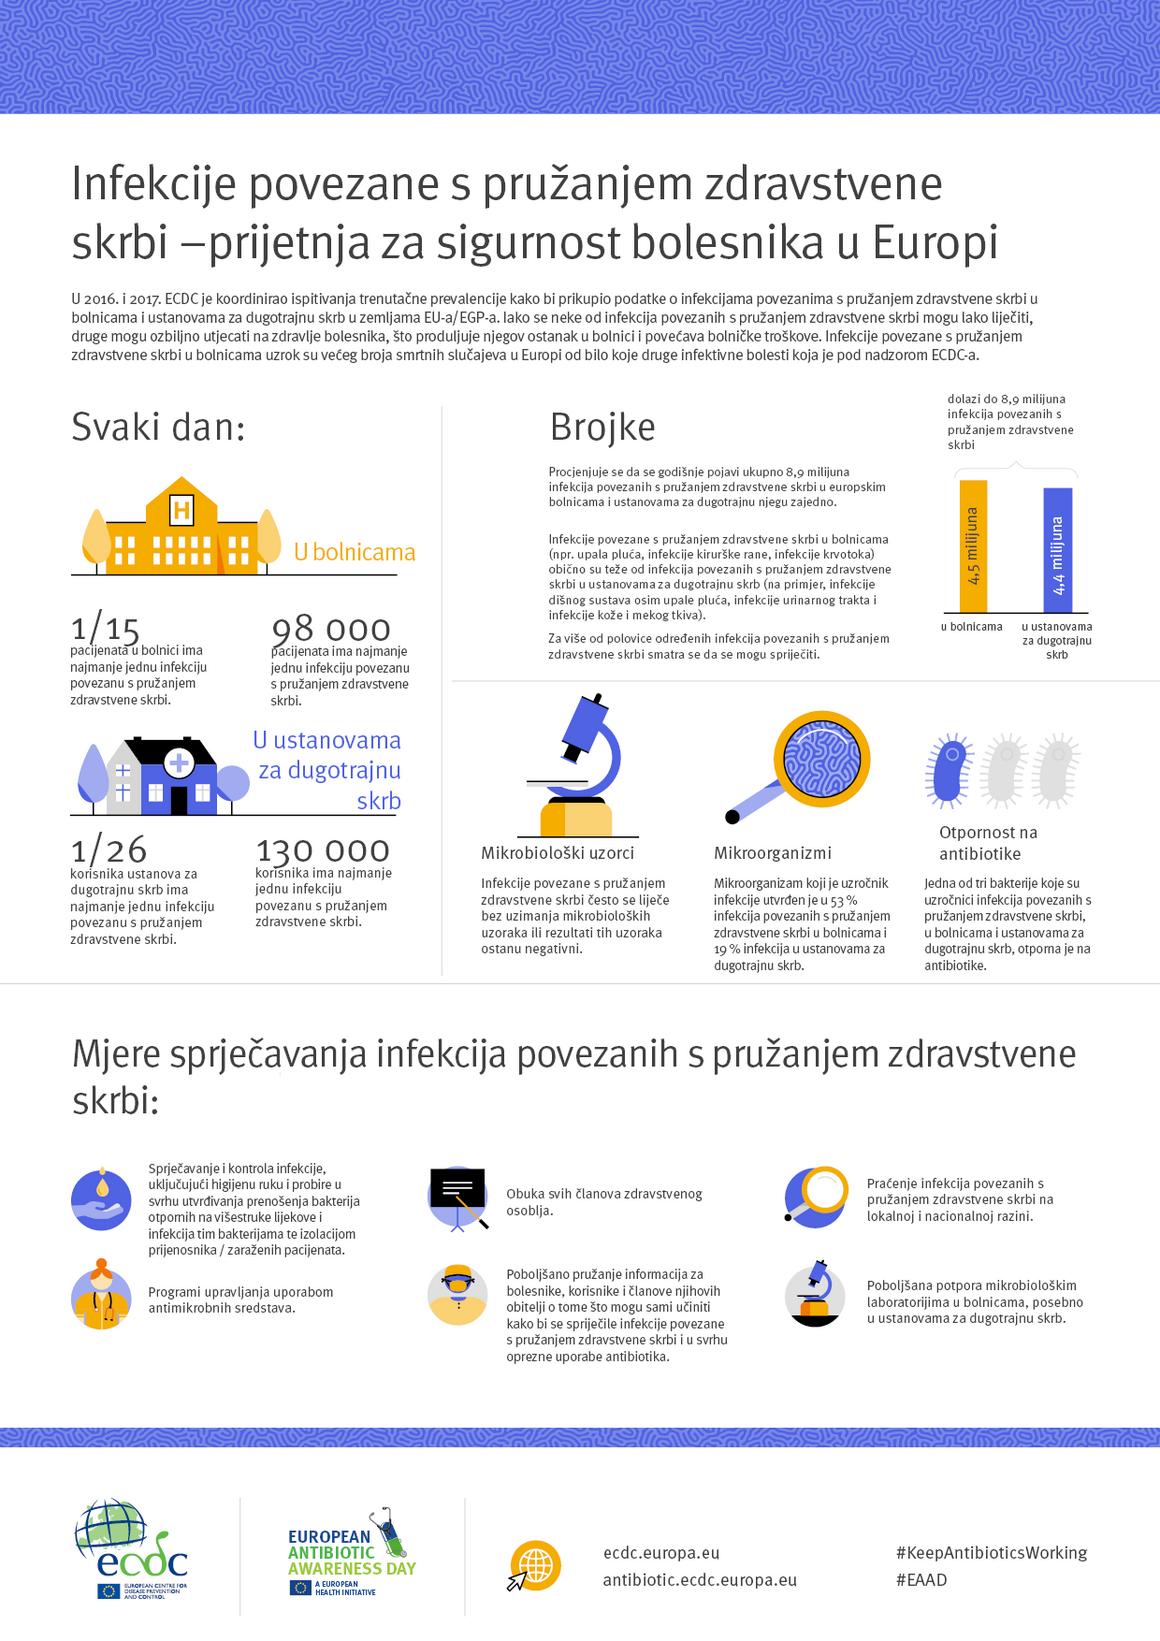 Infekcije povezane s pružanjem zdravstvene skrbi – prijetnja za sigurnost bolesnika u Europi